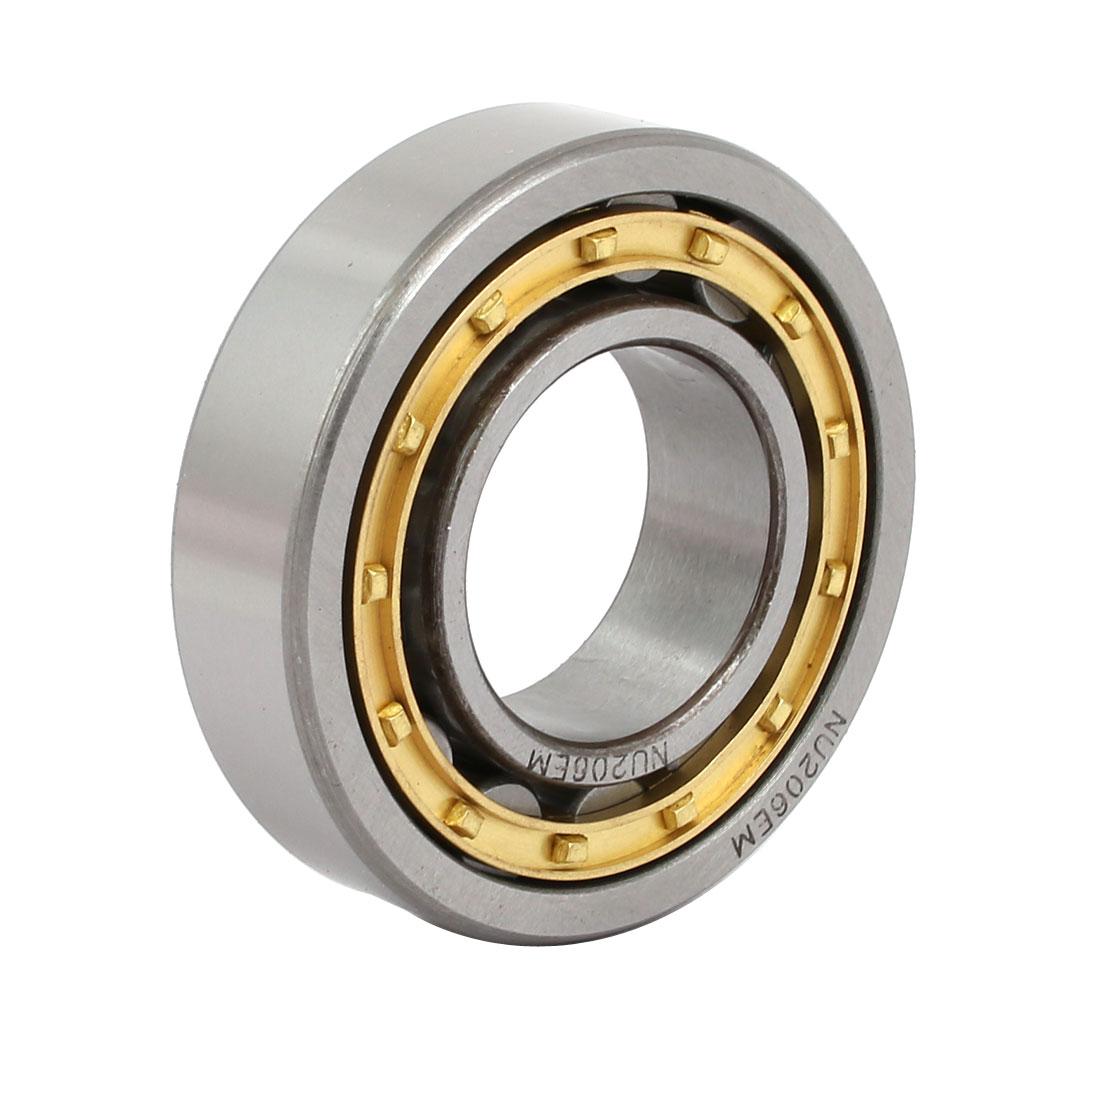 NU206EM 62mmx30mmx15mm Single Row Cylindrical Roller Bearing